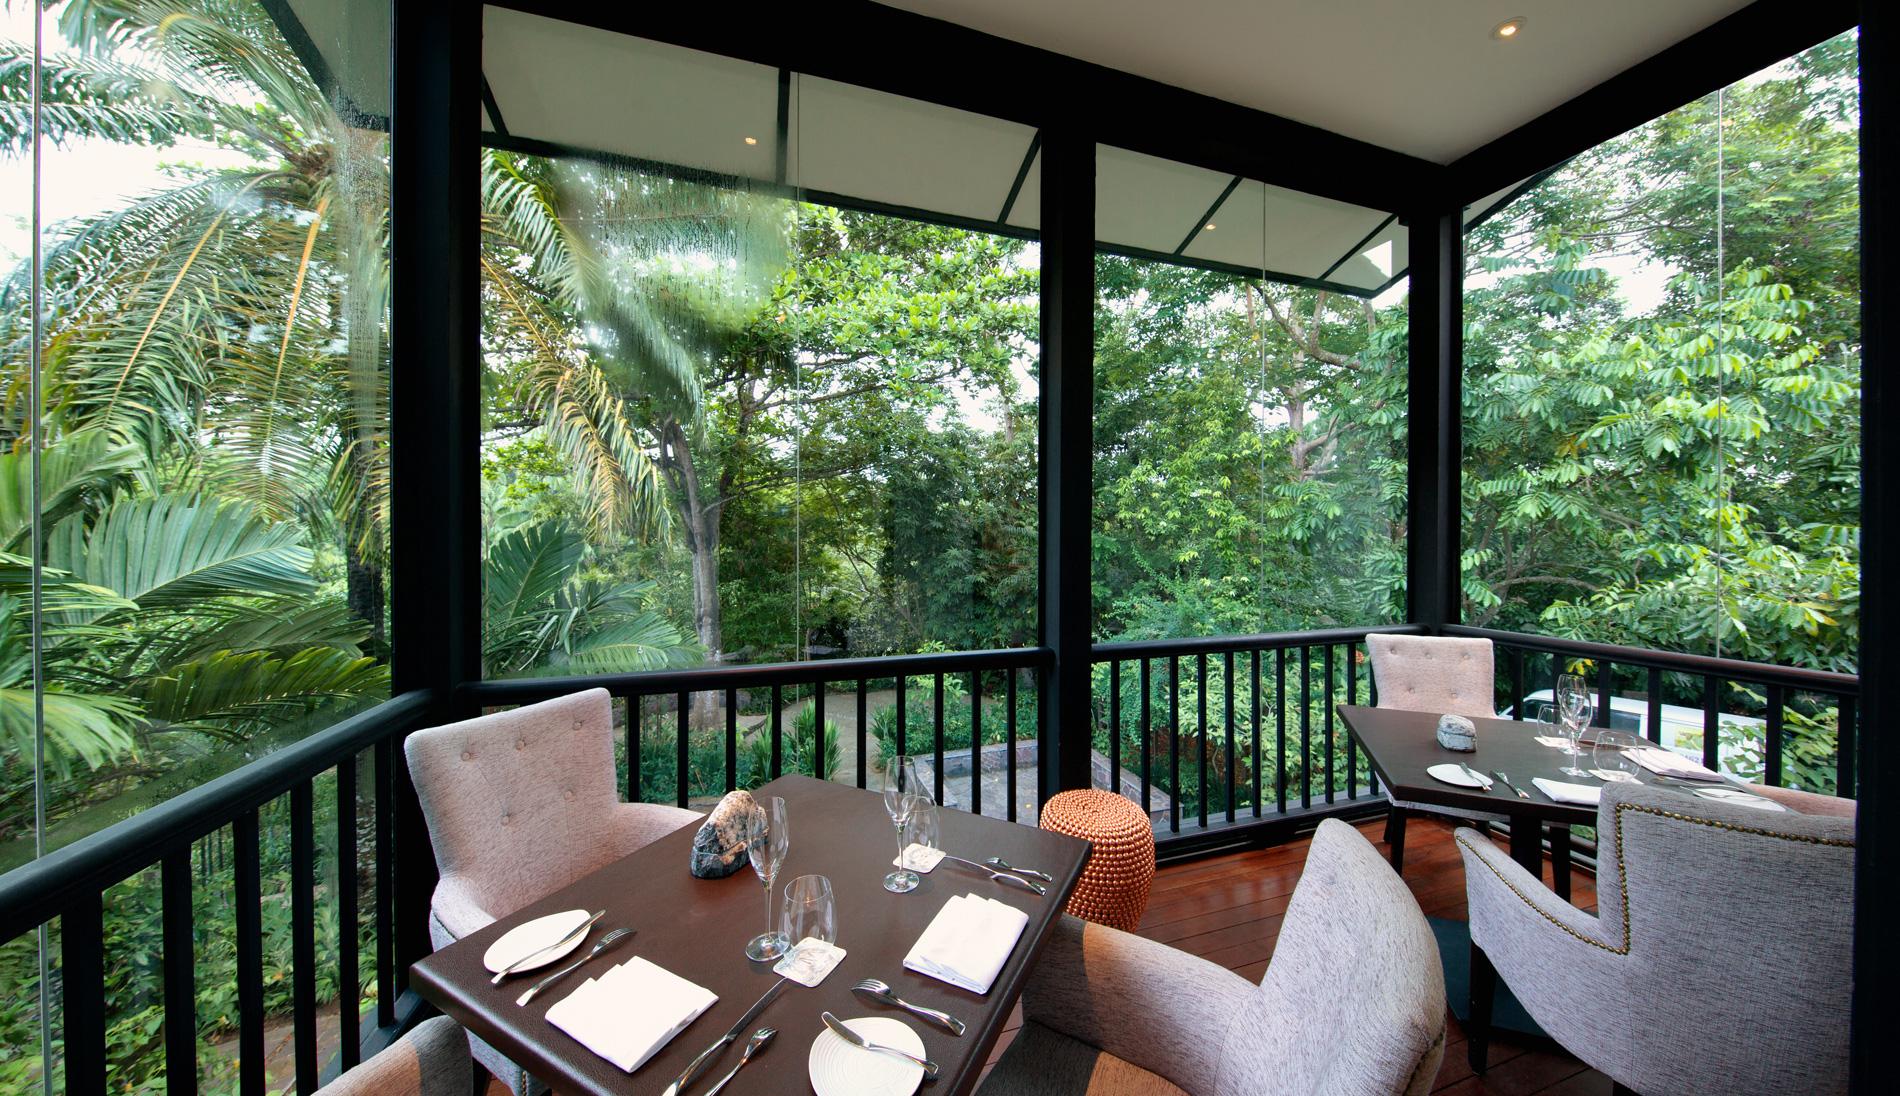 https://cdn.cnn.com/cnnnext/dam/assets/151204160137-singapore-botanic-gardens-corner-housedarren-soh.jpg